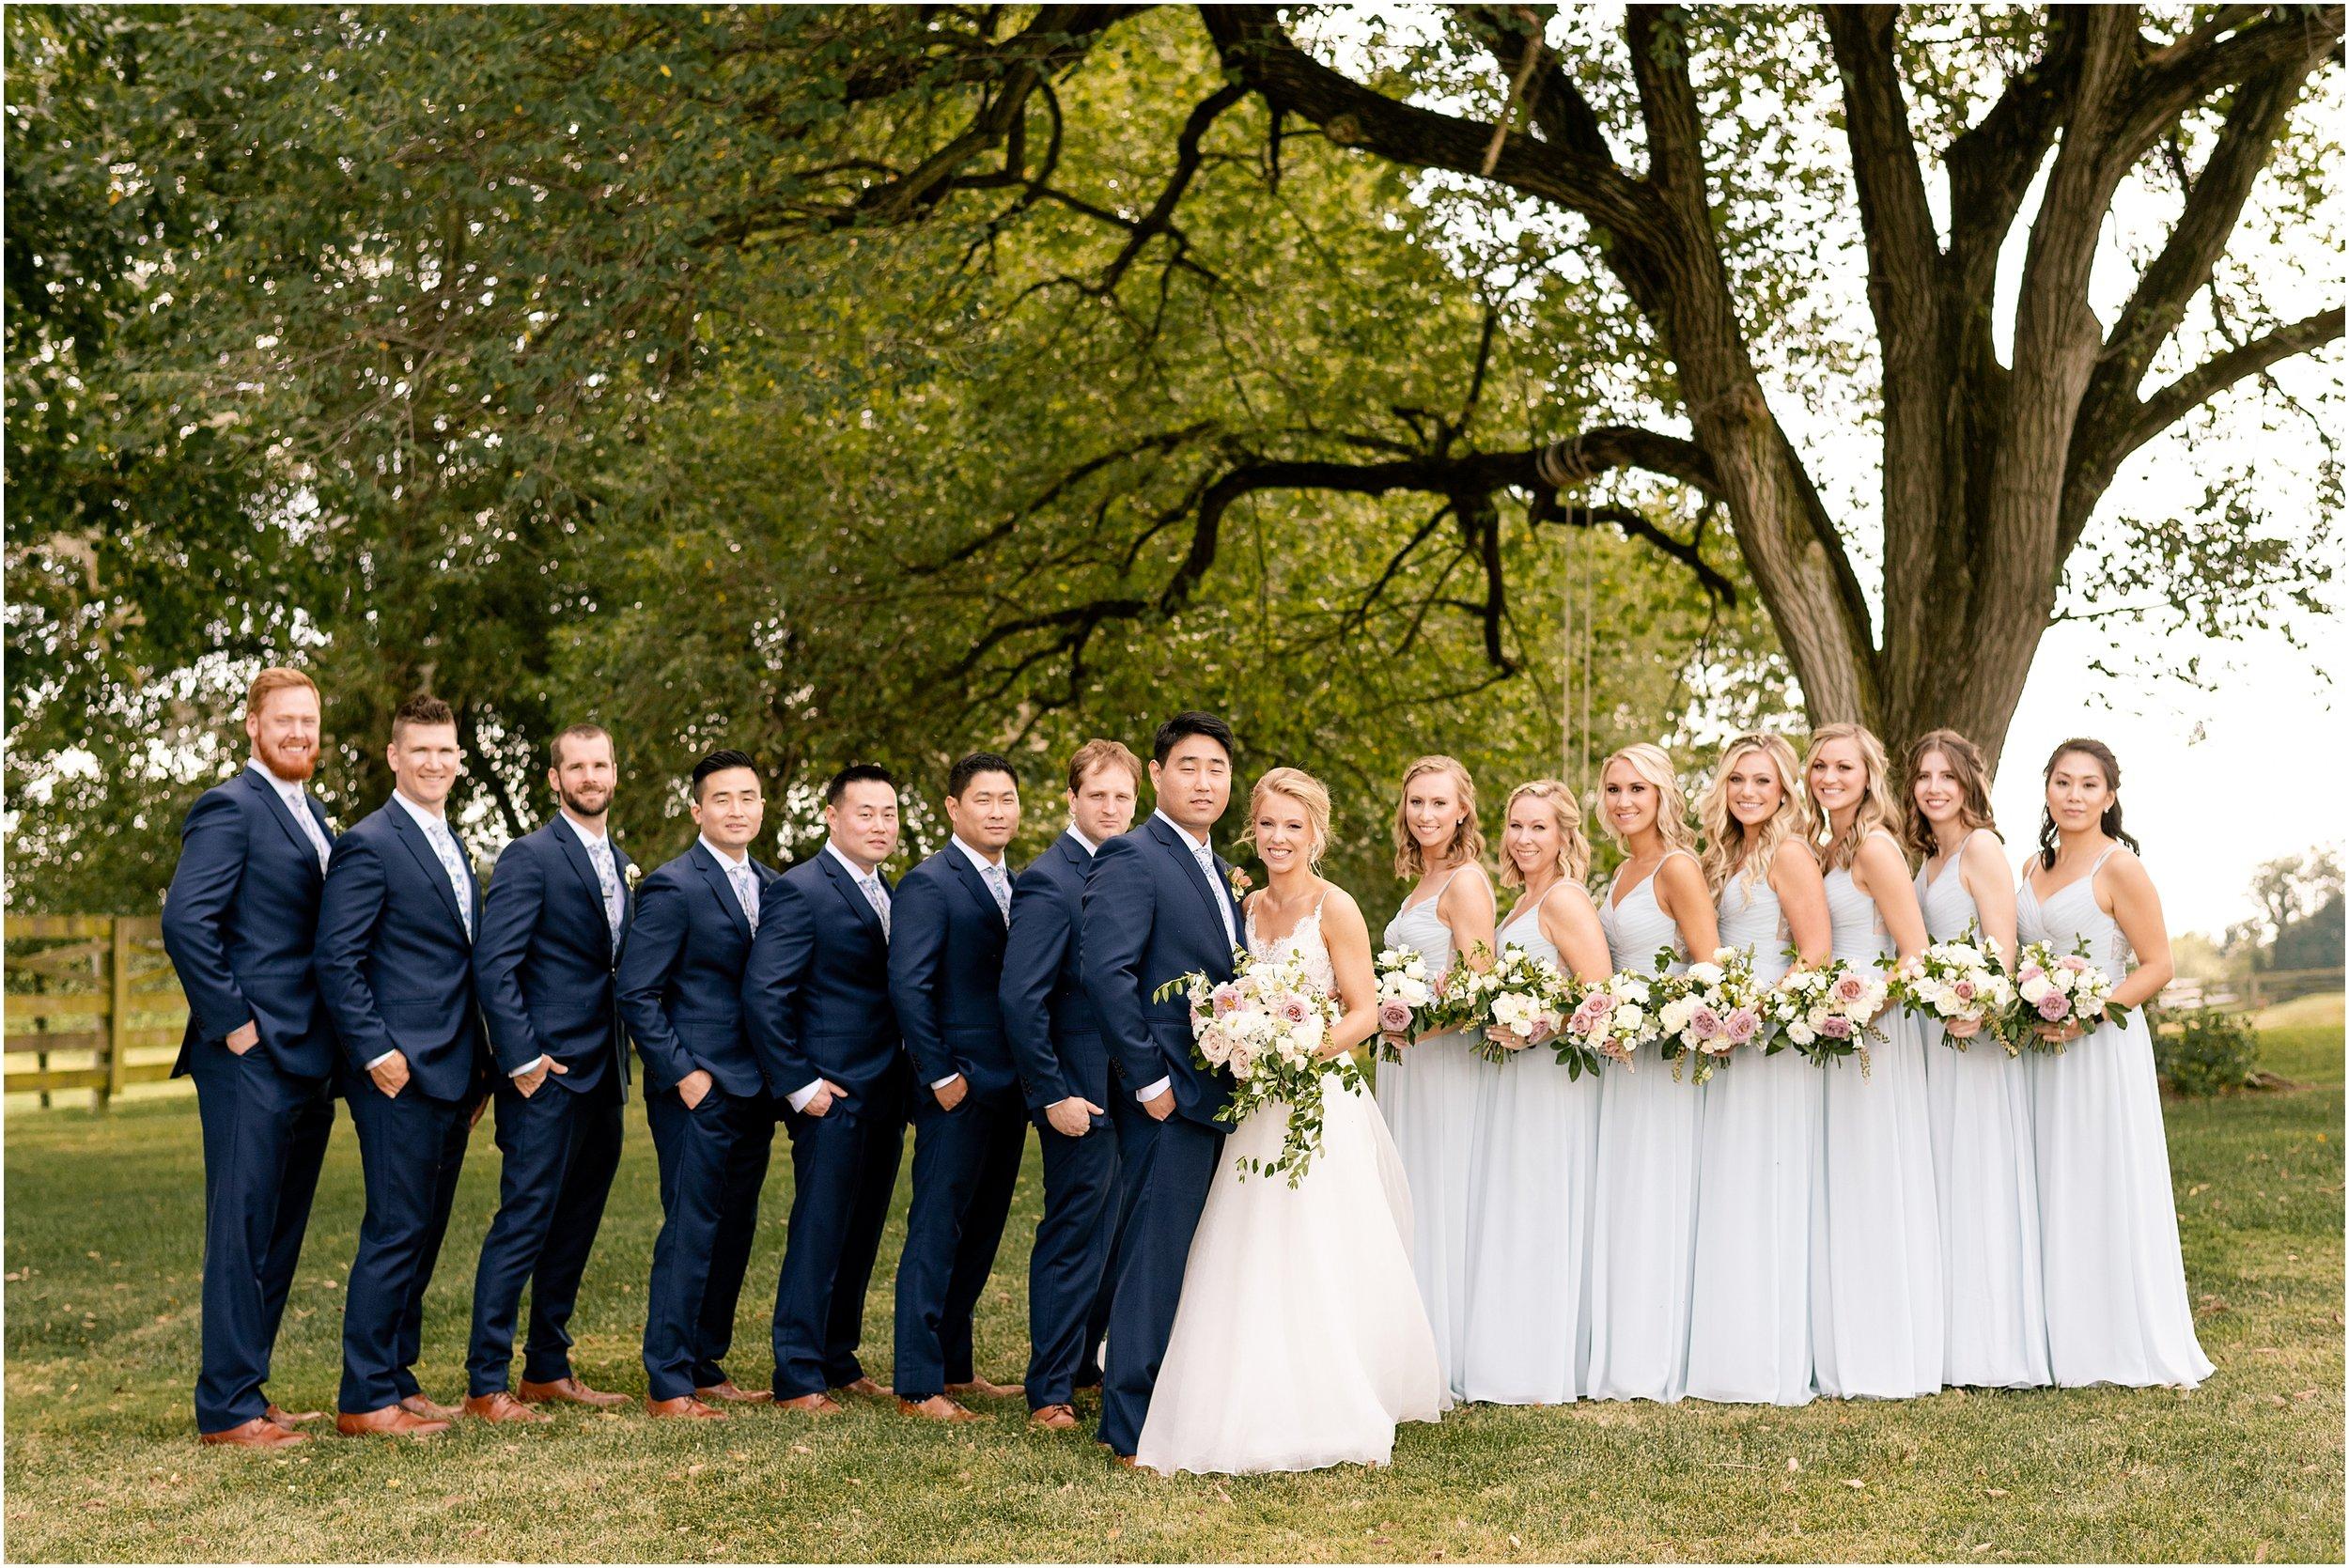 hannah leigh photography Walkers Overlook Wedding Walkersville MD_3522.jpg